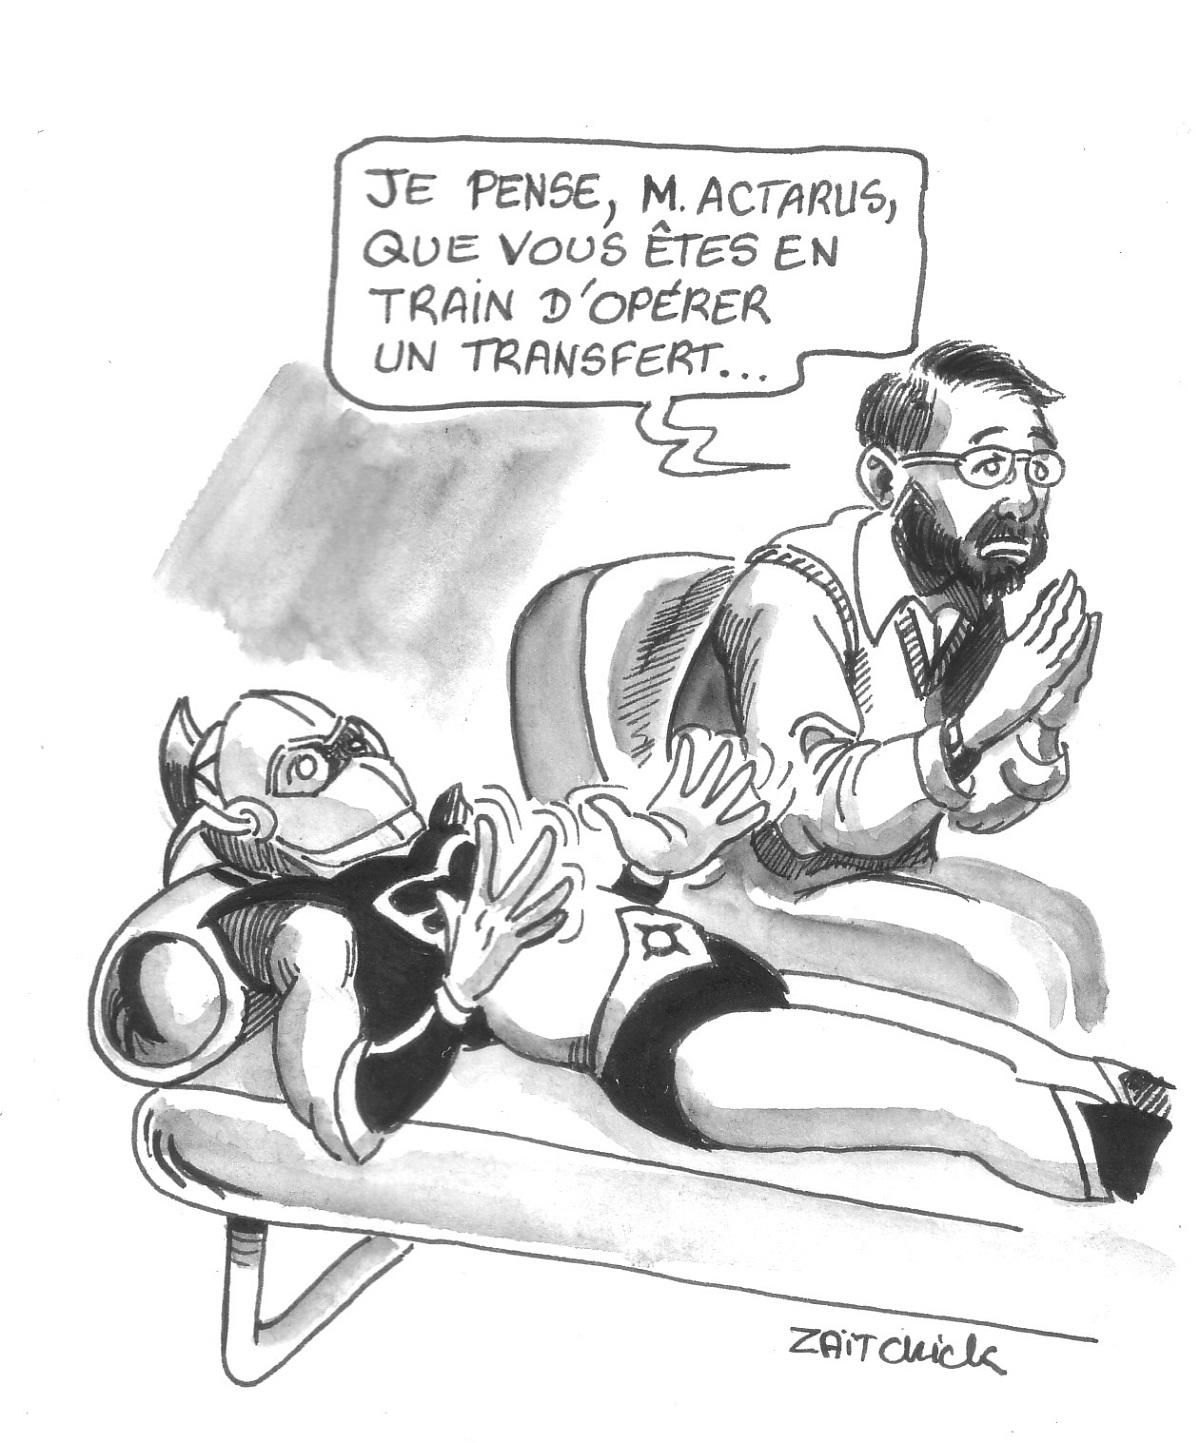 dessin humoristique montrant Actarus en pleine séance de psychanalyse